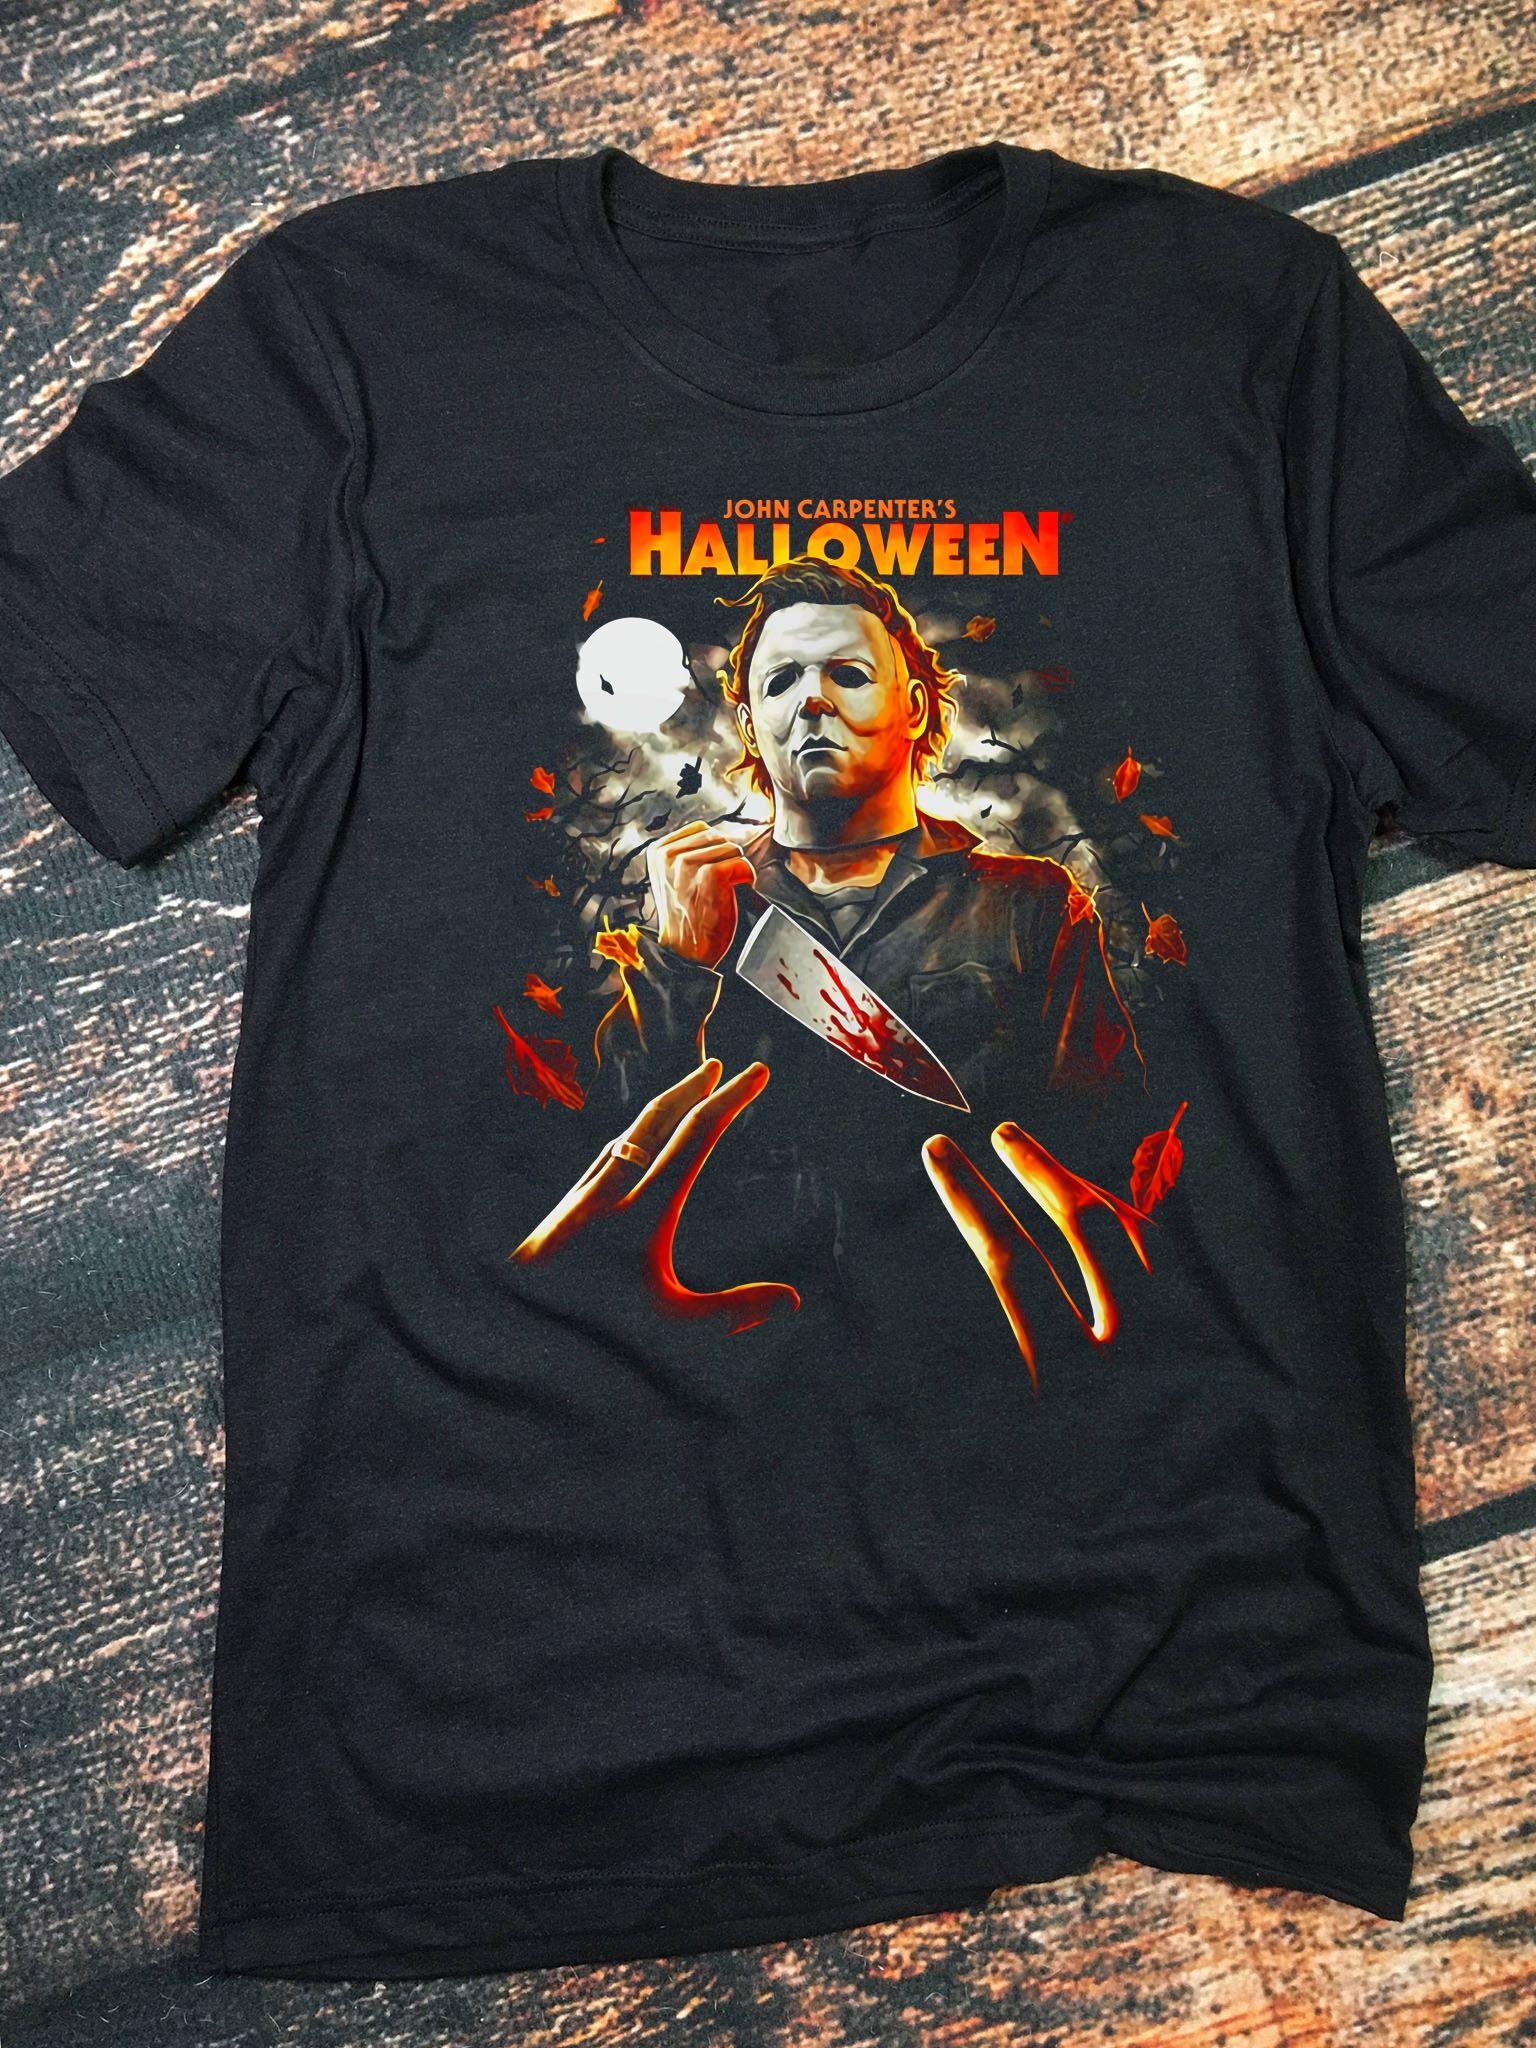 Michael Myers Halloween 1978 Women's TShirt in 2020